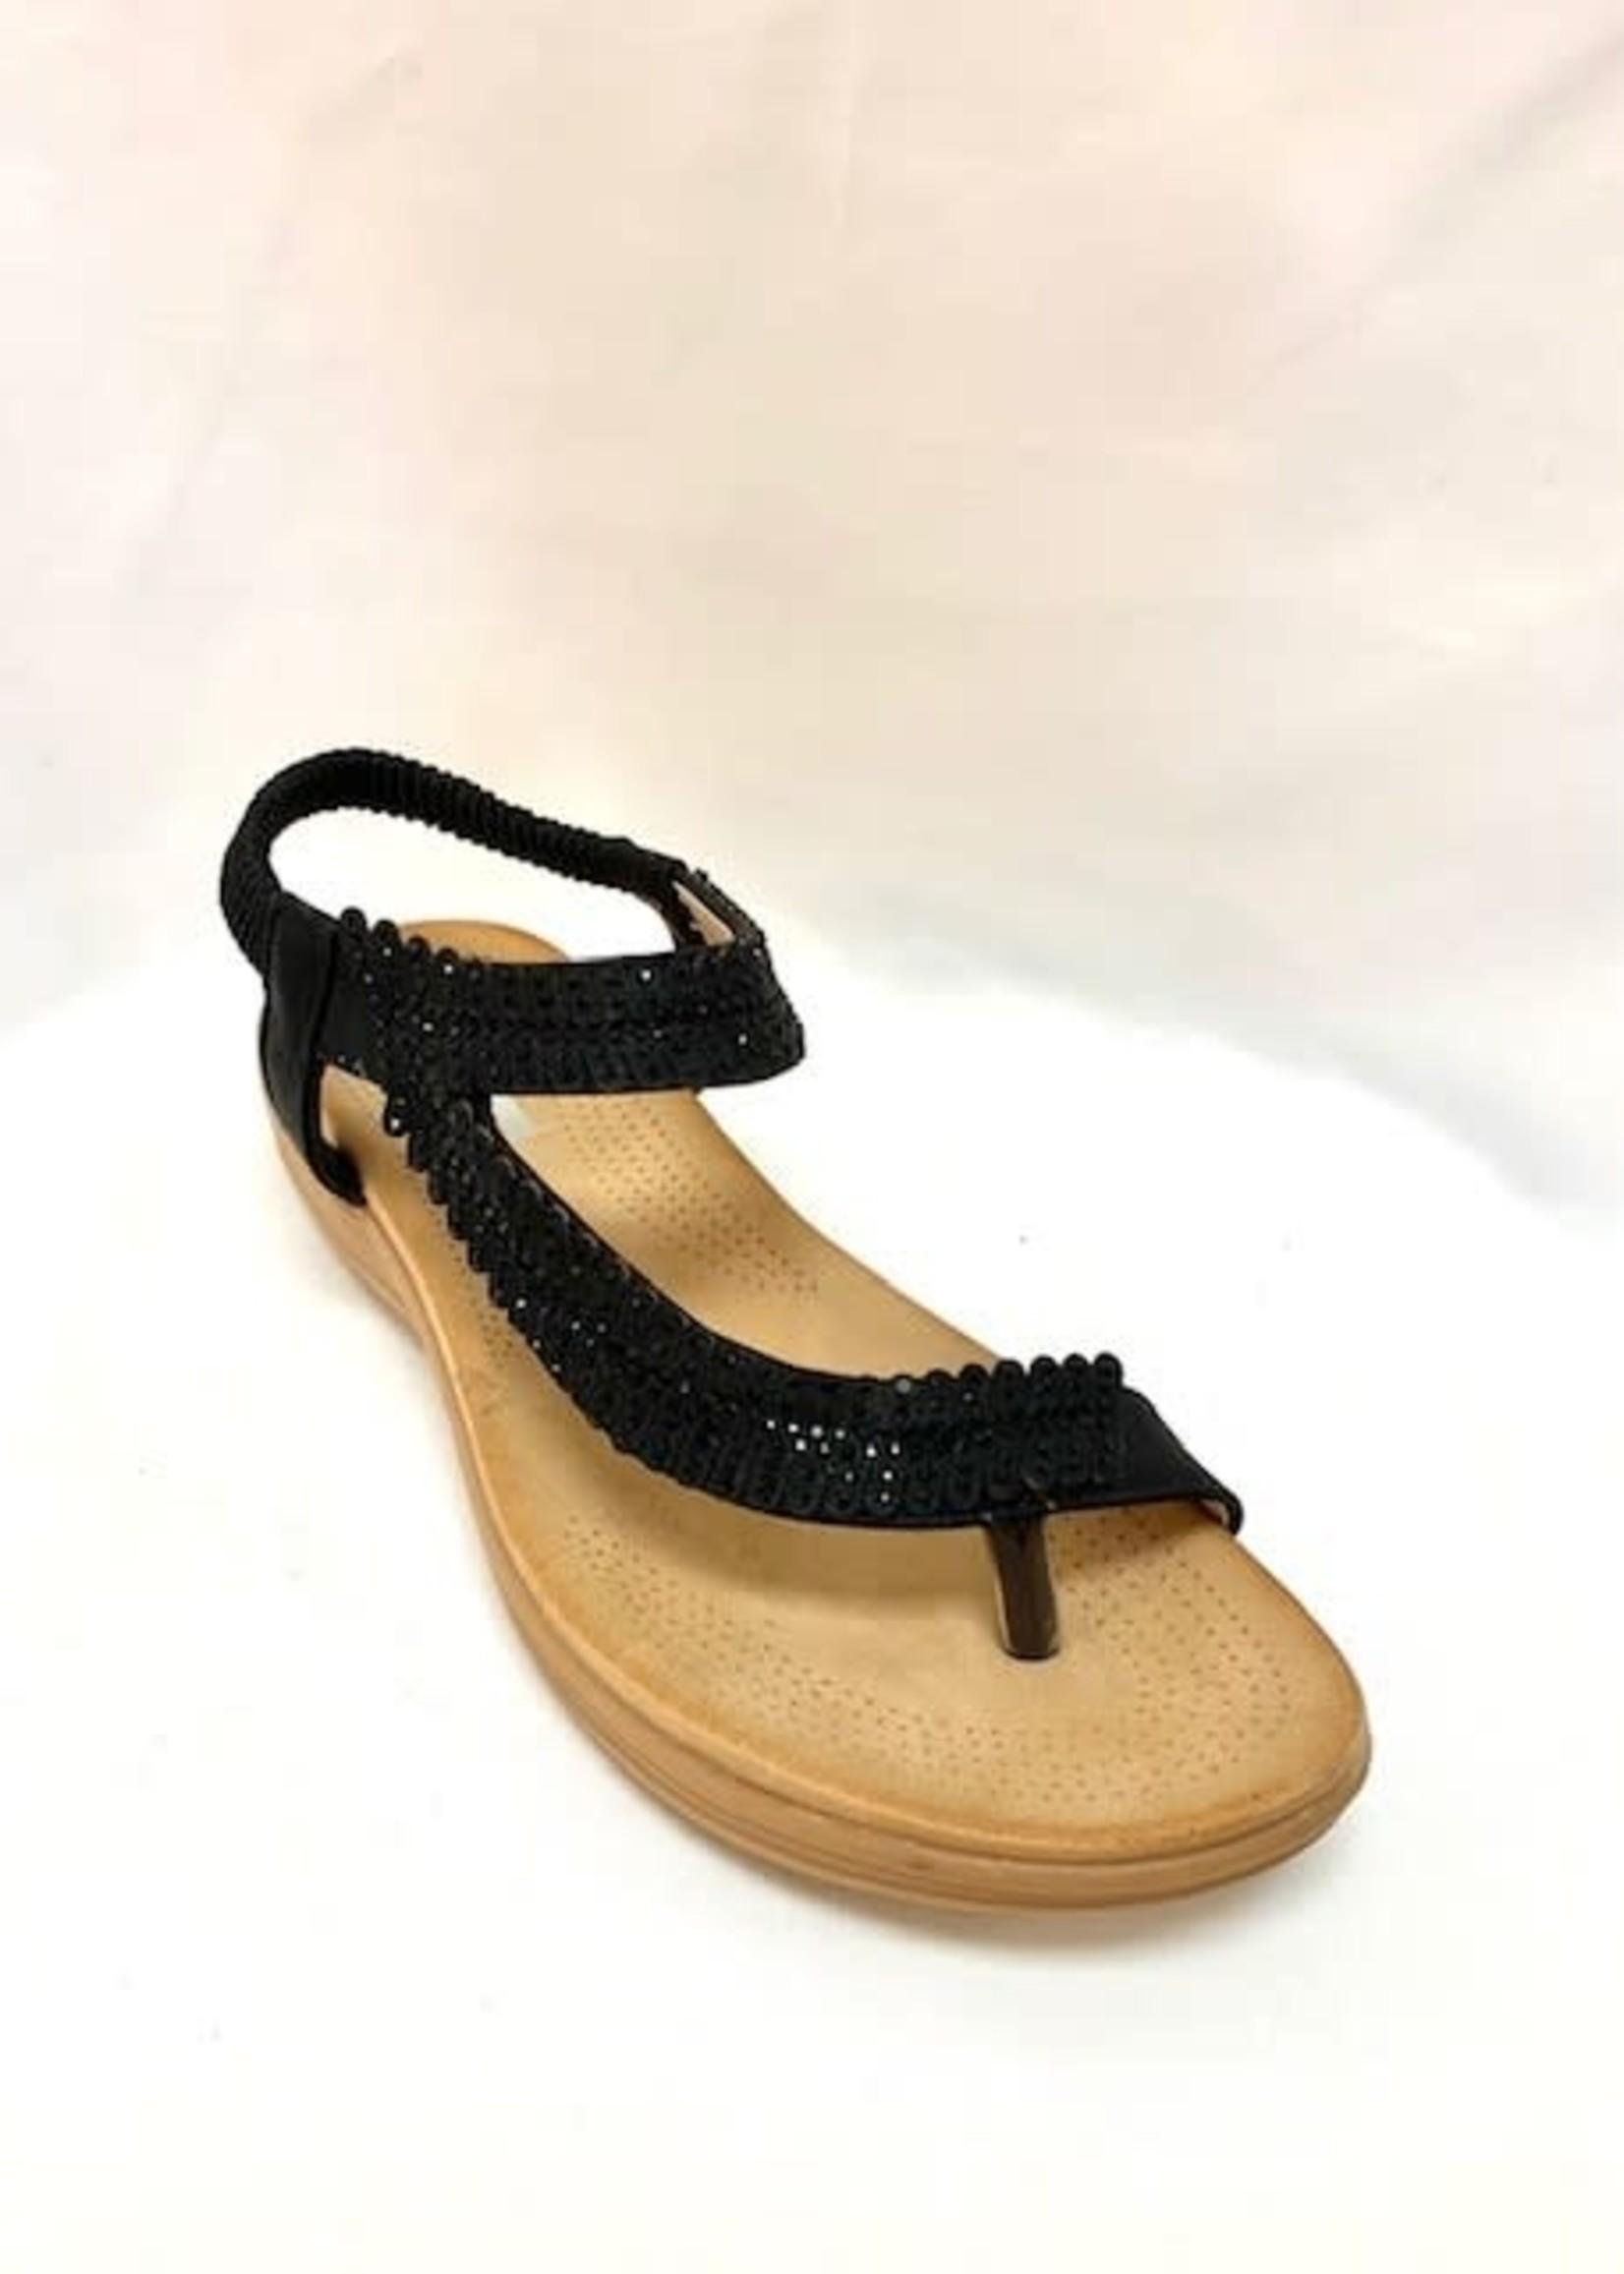 JJ Thong sandals